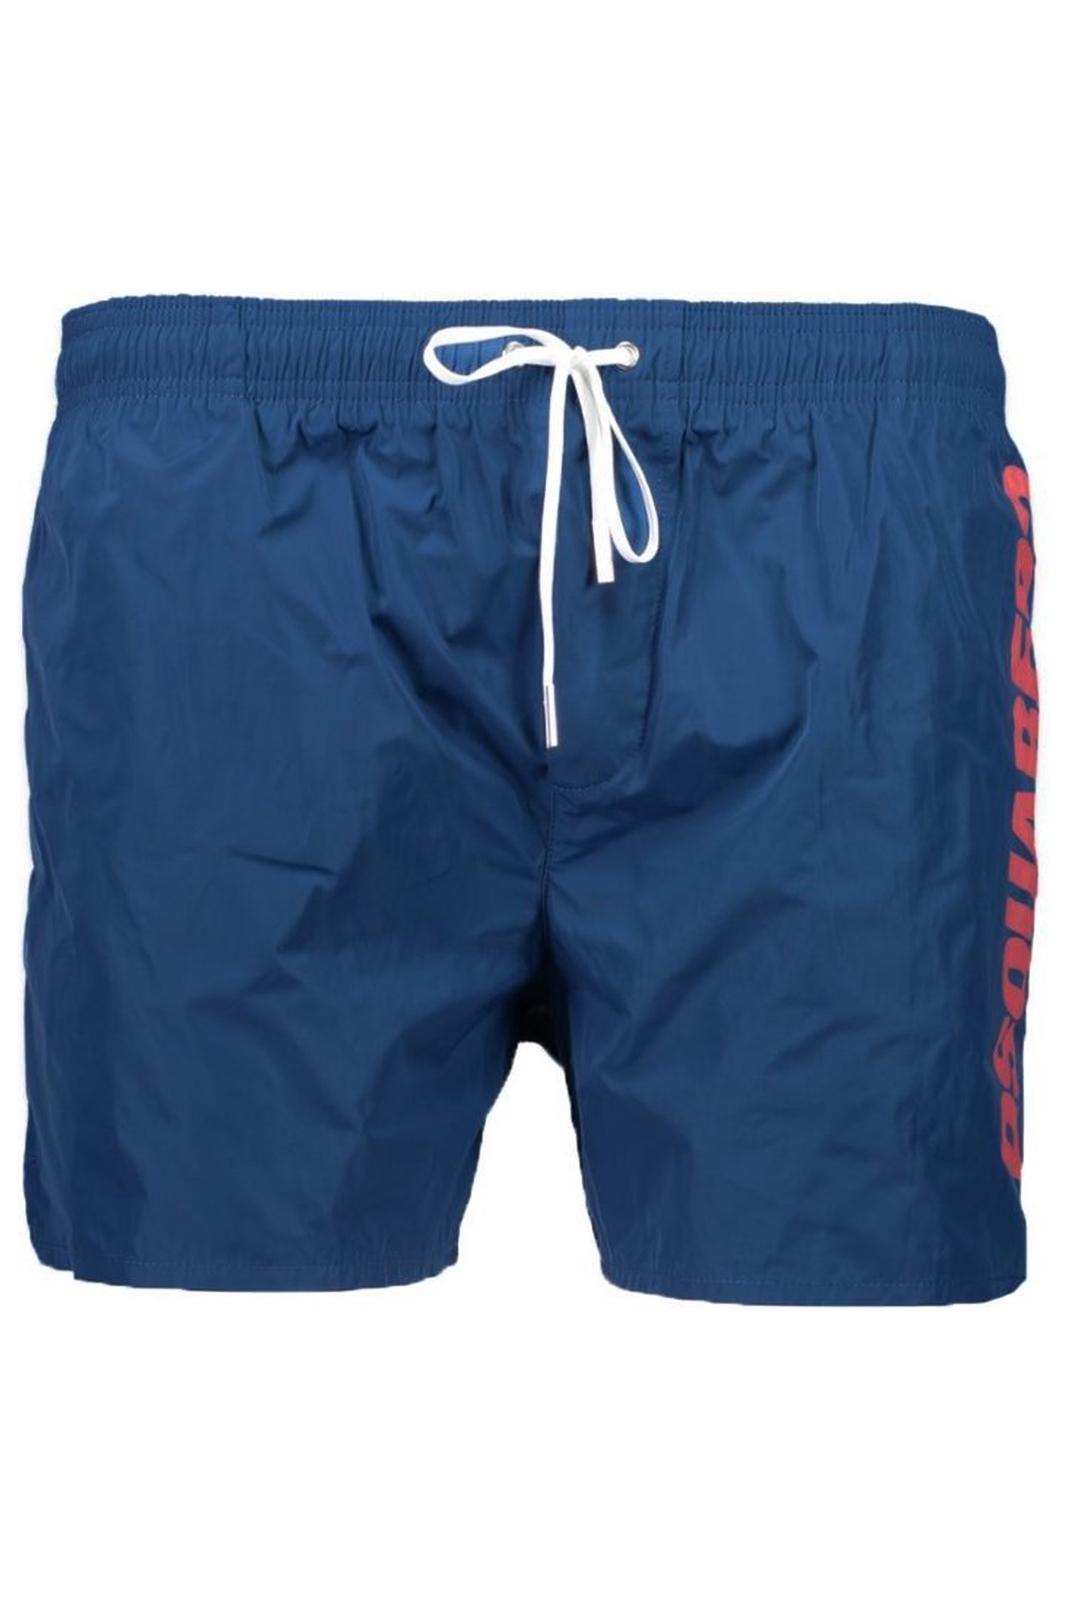 Shorts de bain  Dsquared2 D7B641760 32046 BLEU